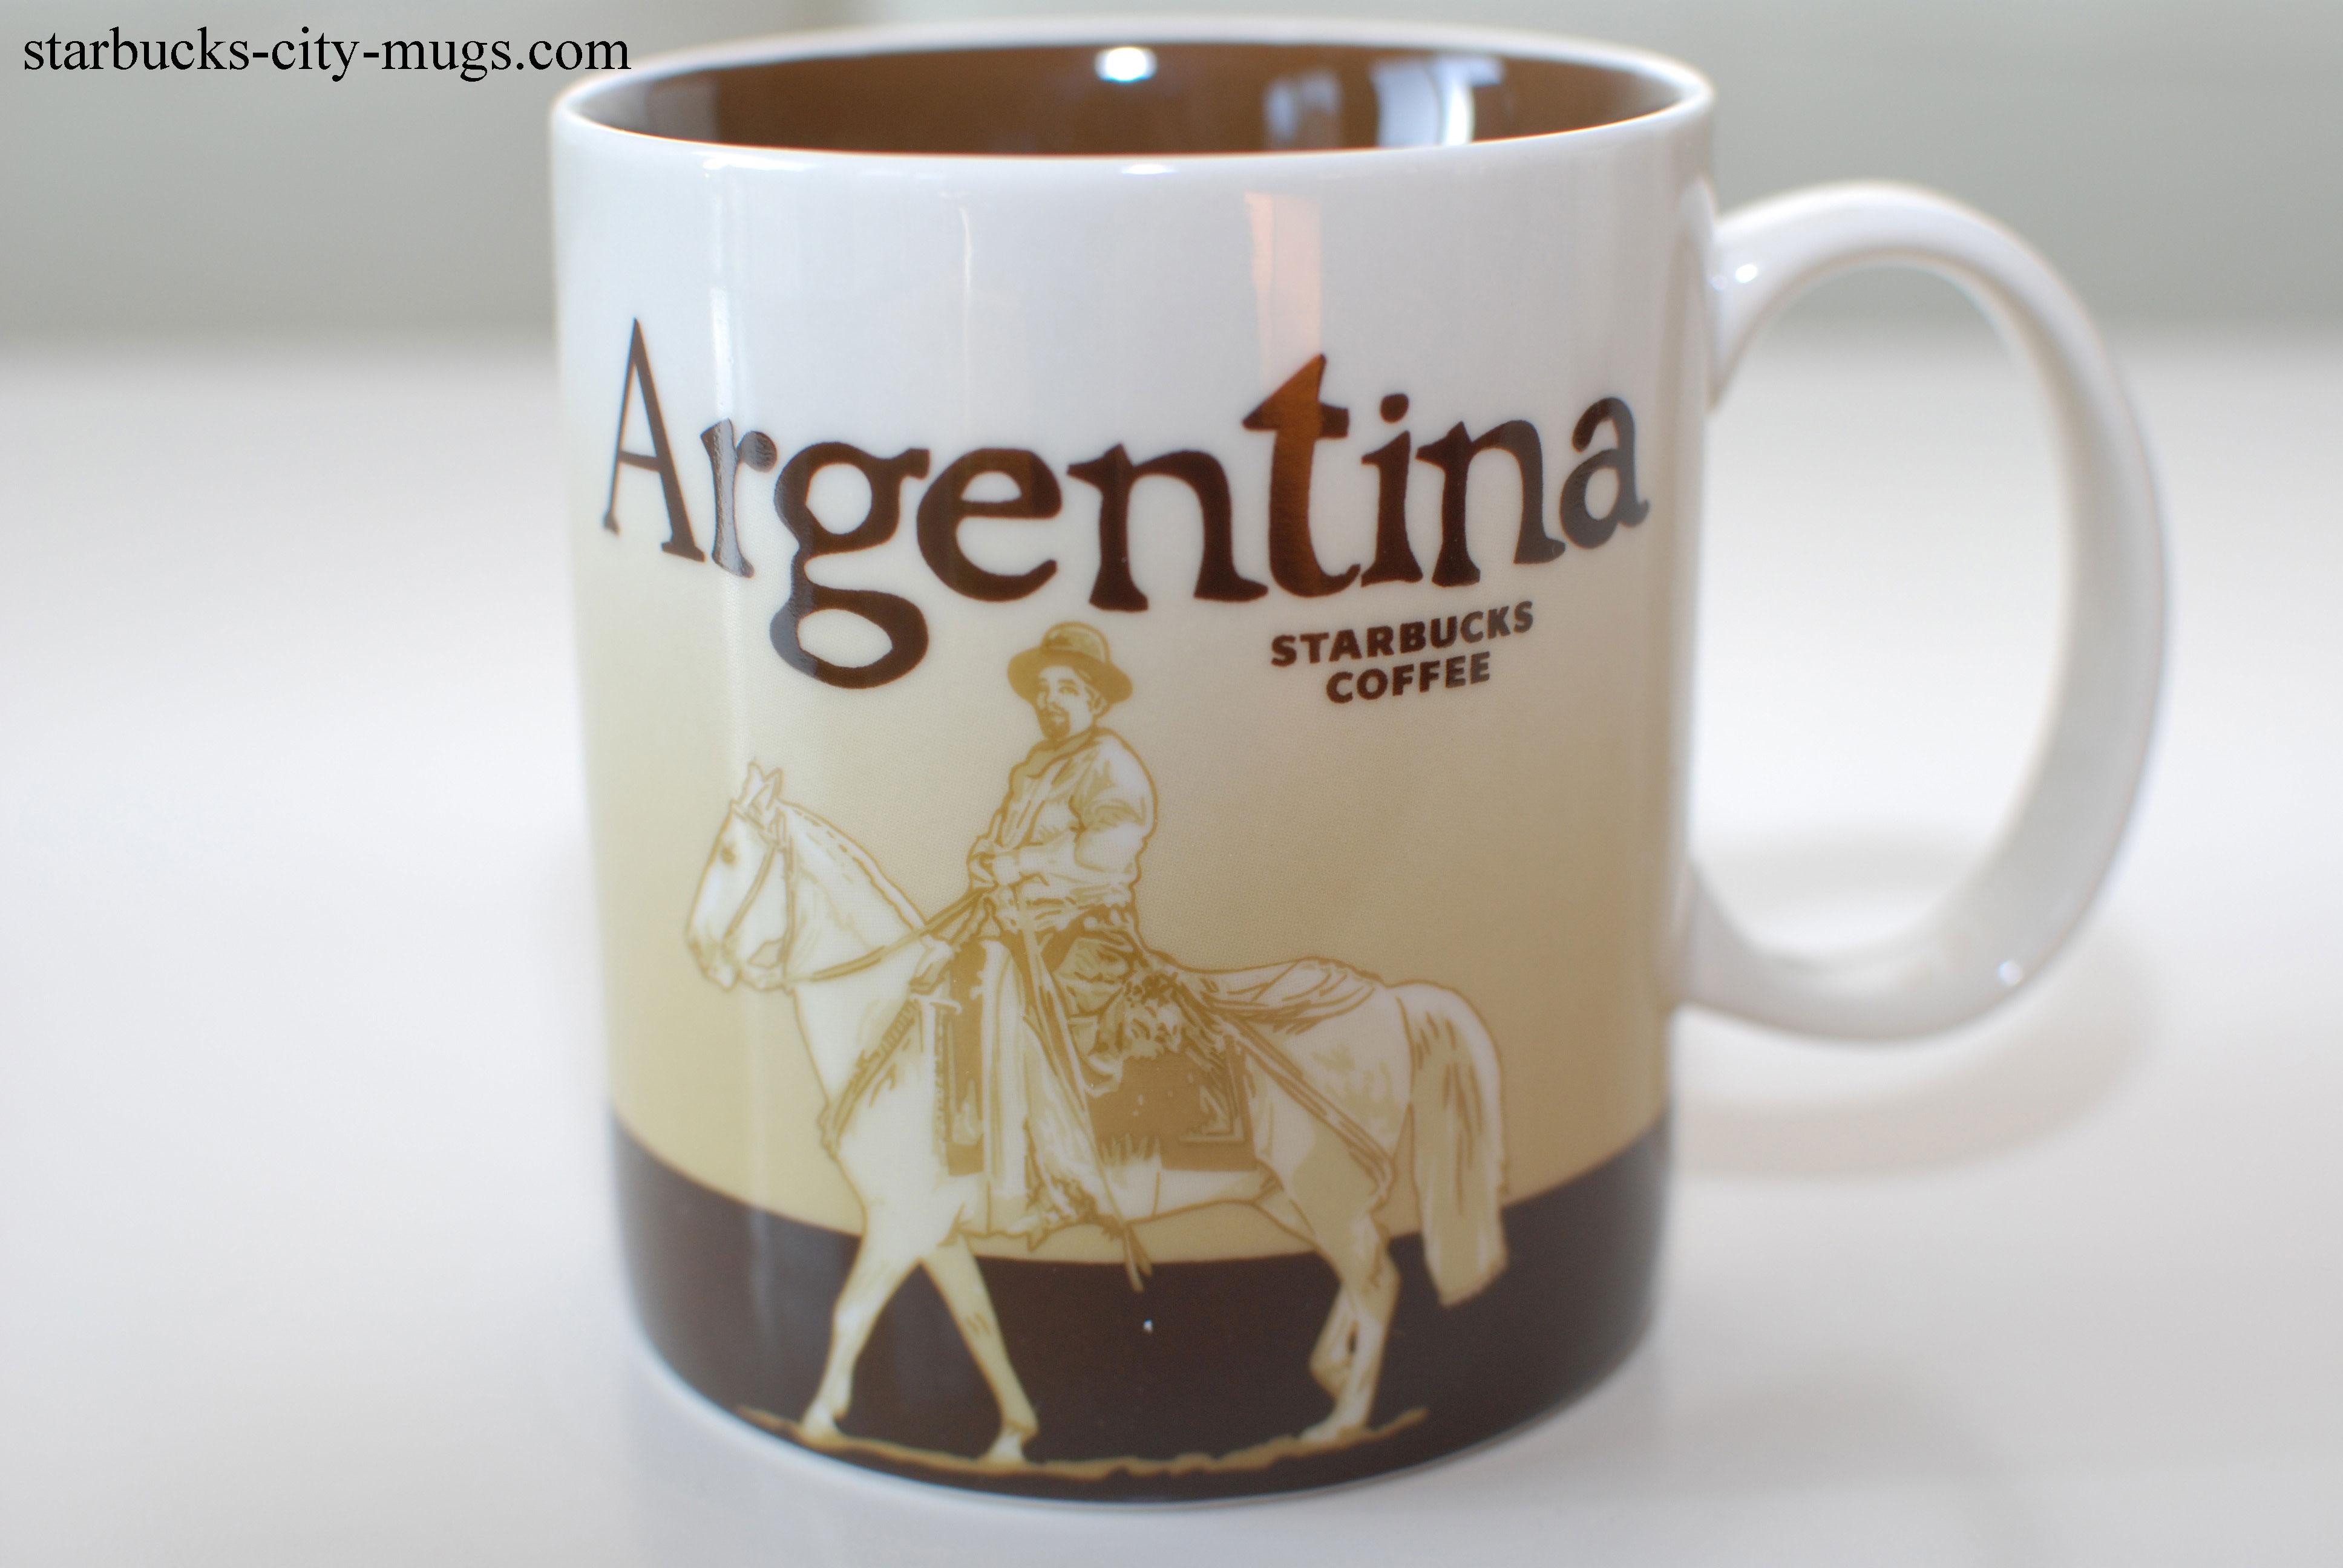 Best Coffee Mugs Argentina Starbucks City Mugs